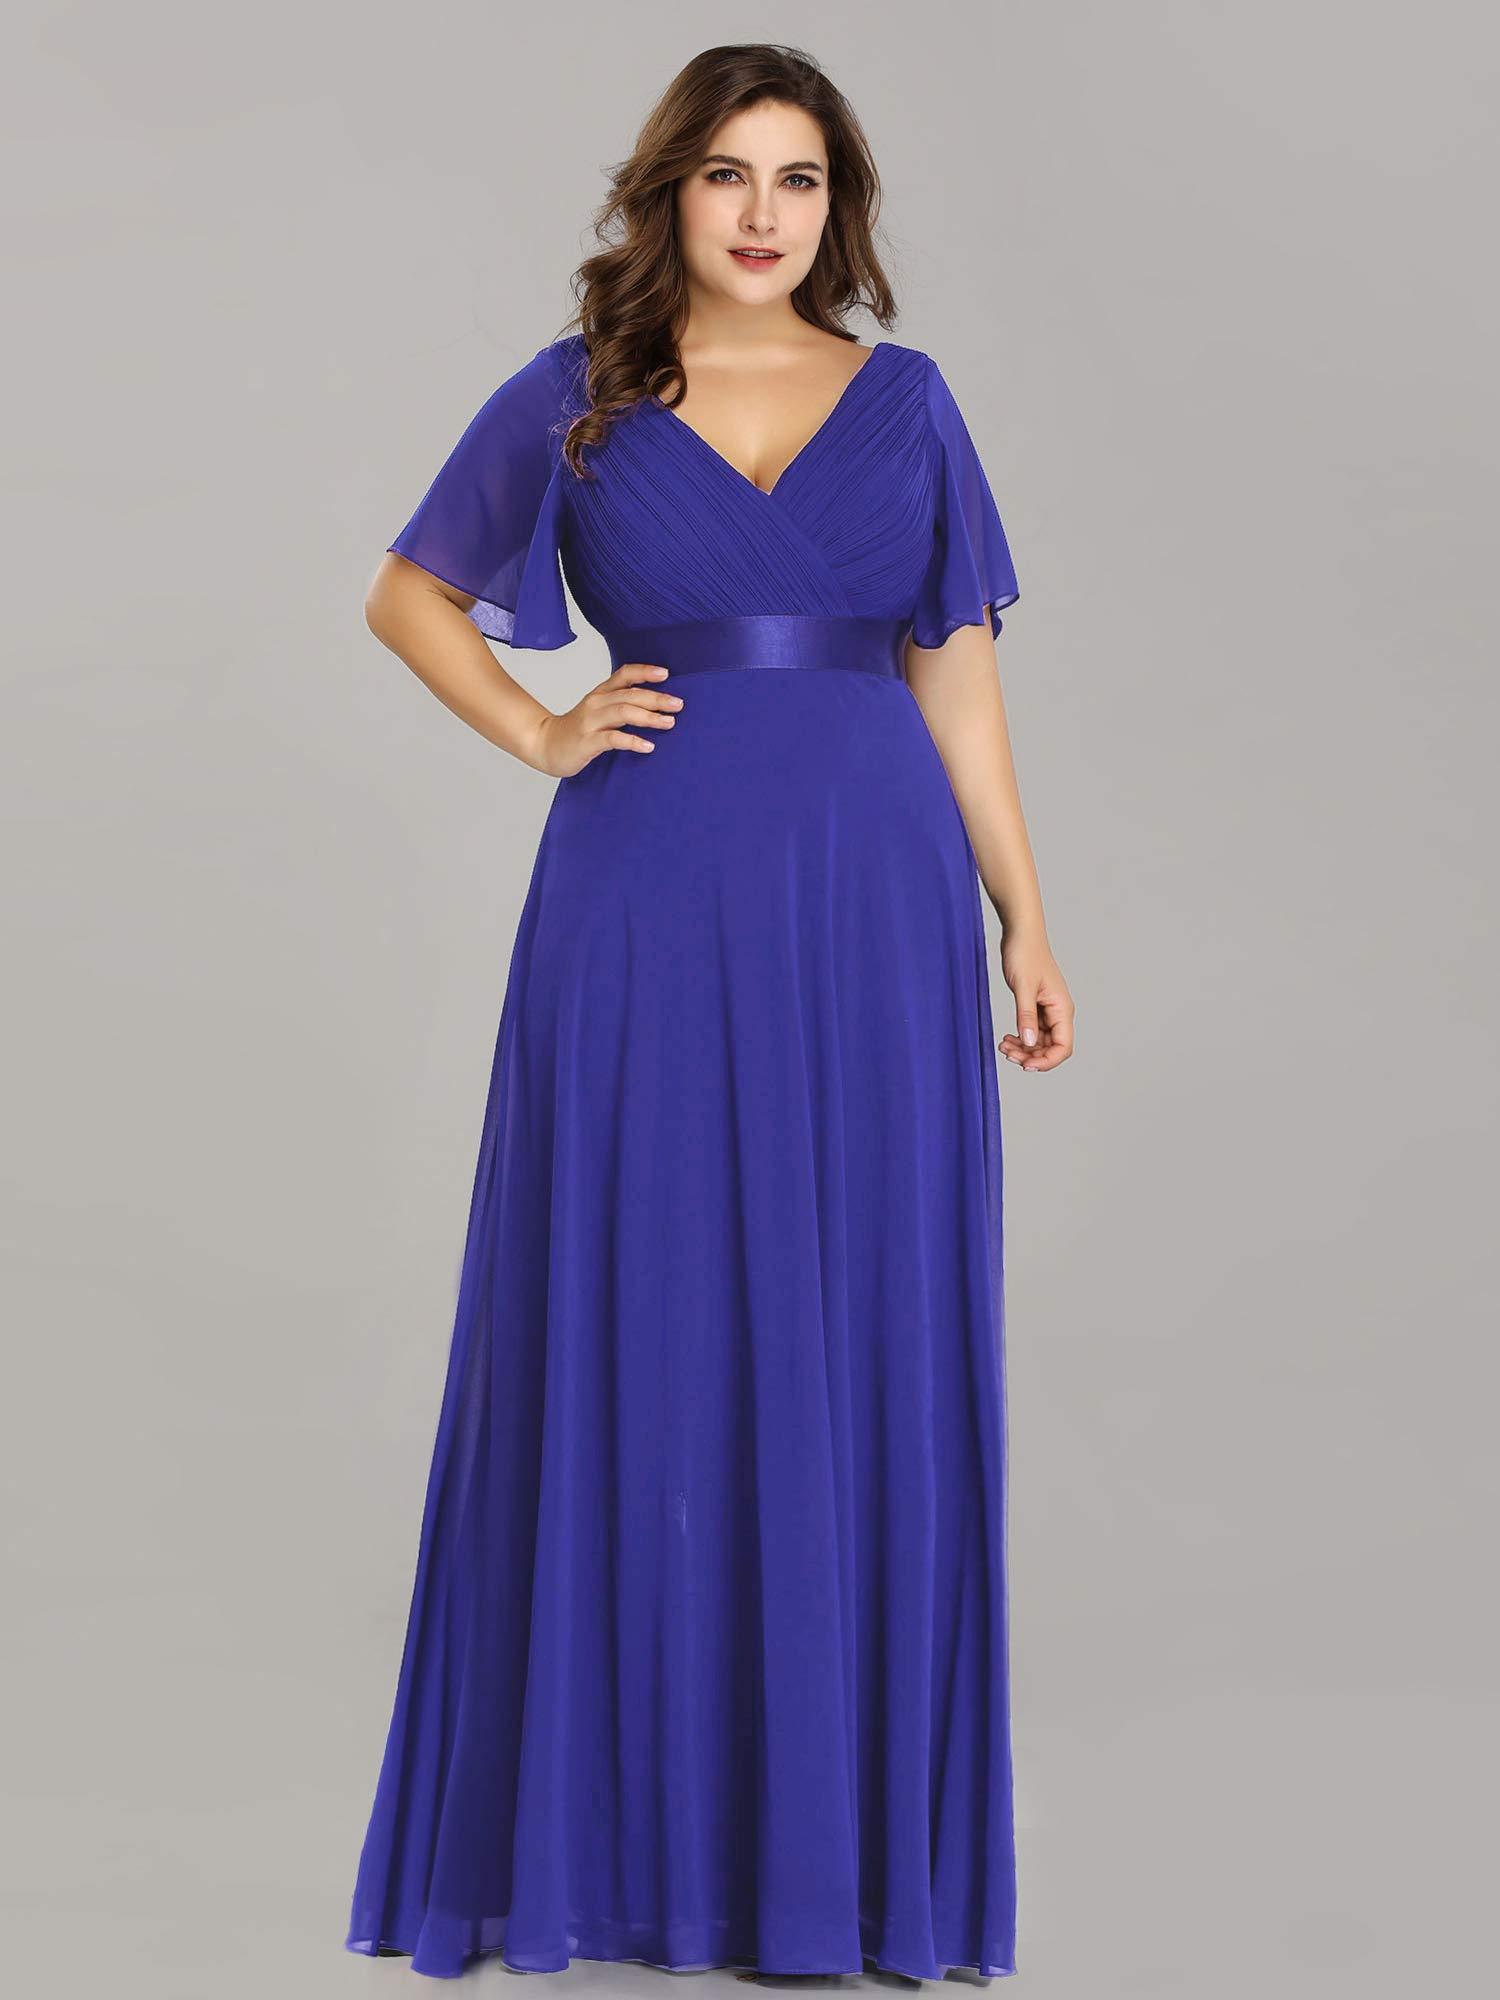 Ever-Pretty V-Neck Ruffle Sleeves Vintage Wedding Maxi Dress Plus Size  Royal Blue US24